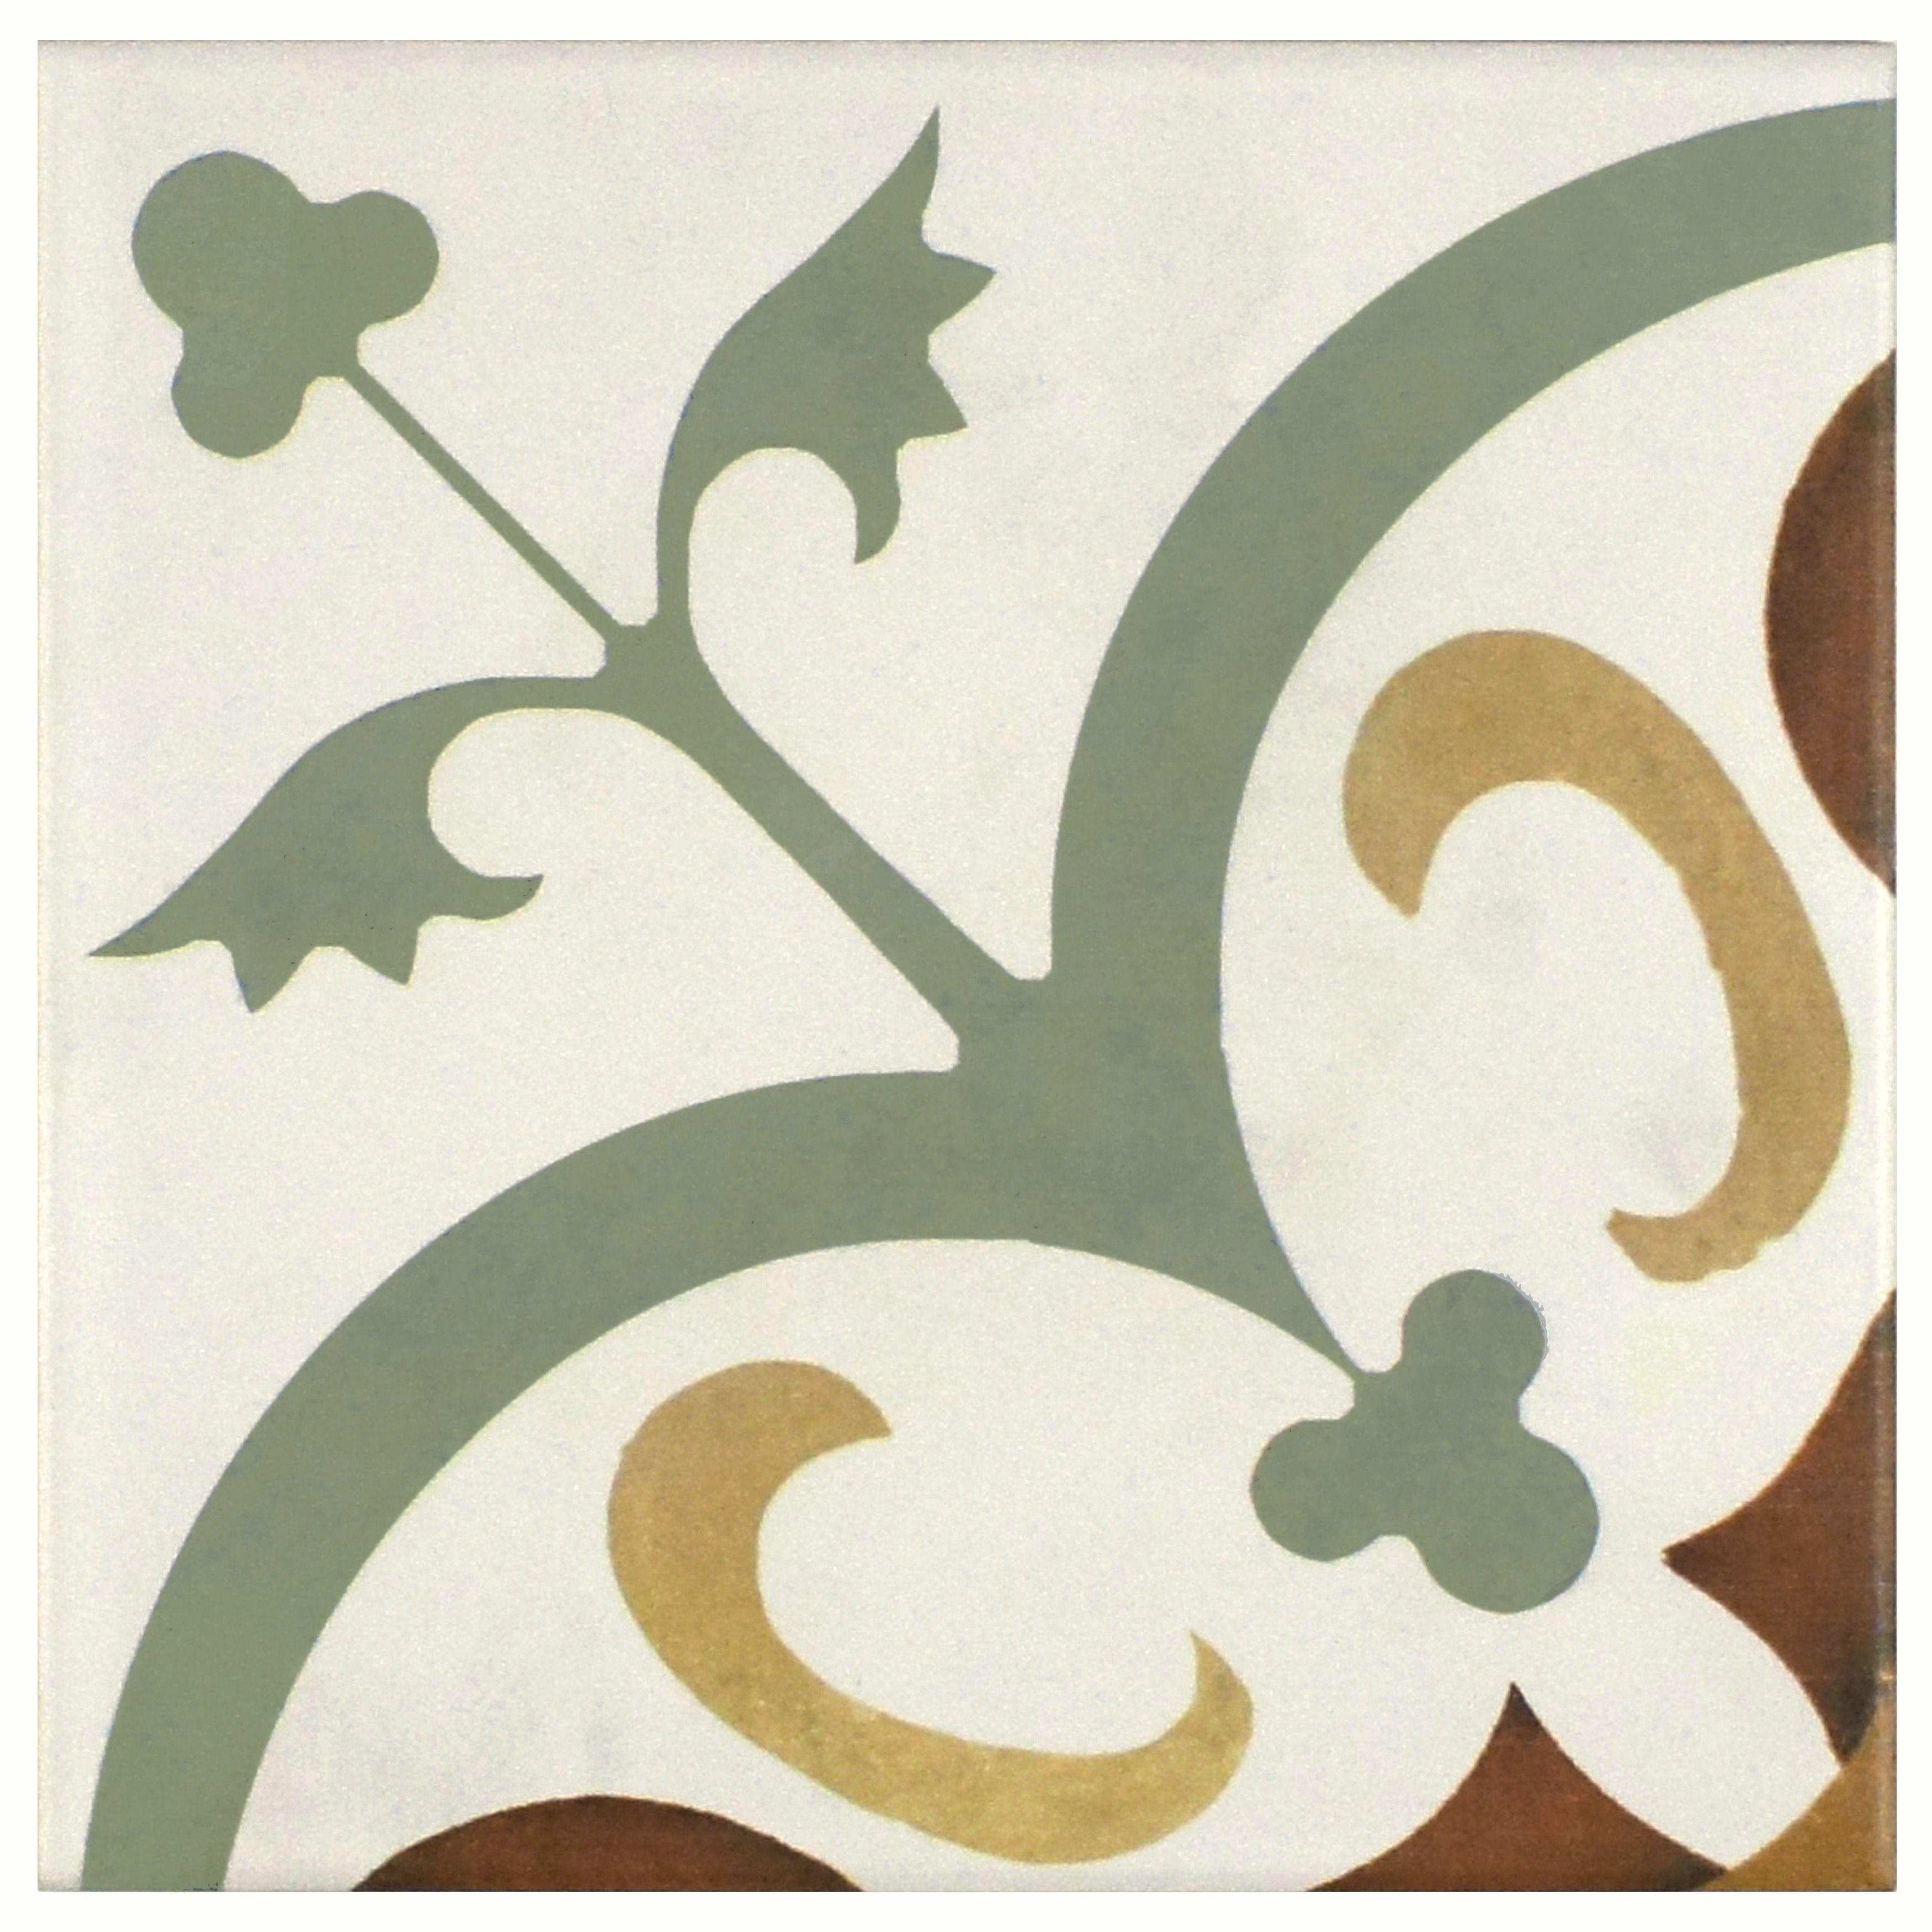 Somertile 7 75x7 75 Inch Renaissance Memory Ceramic Floor And Wall Tile 25 Tiles 11 Sqft Ceramic Floor Merola Tile Painting Tile